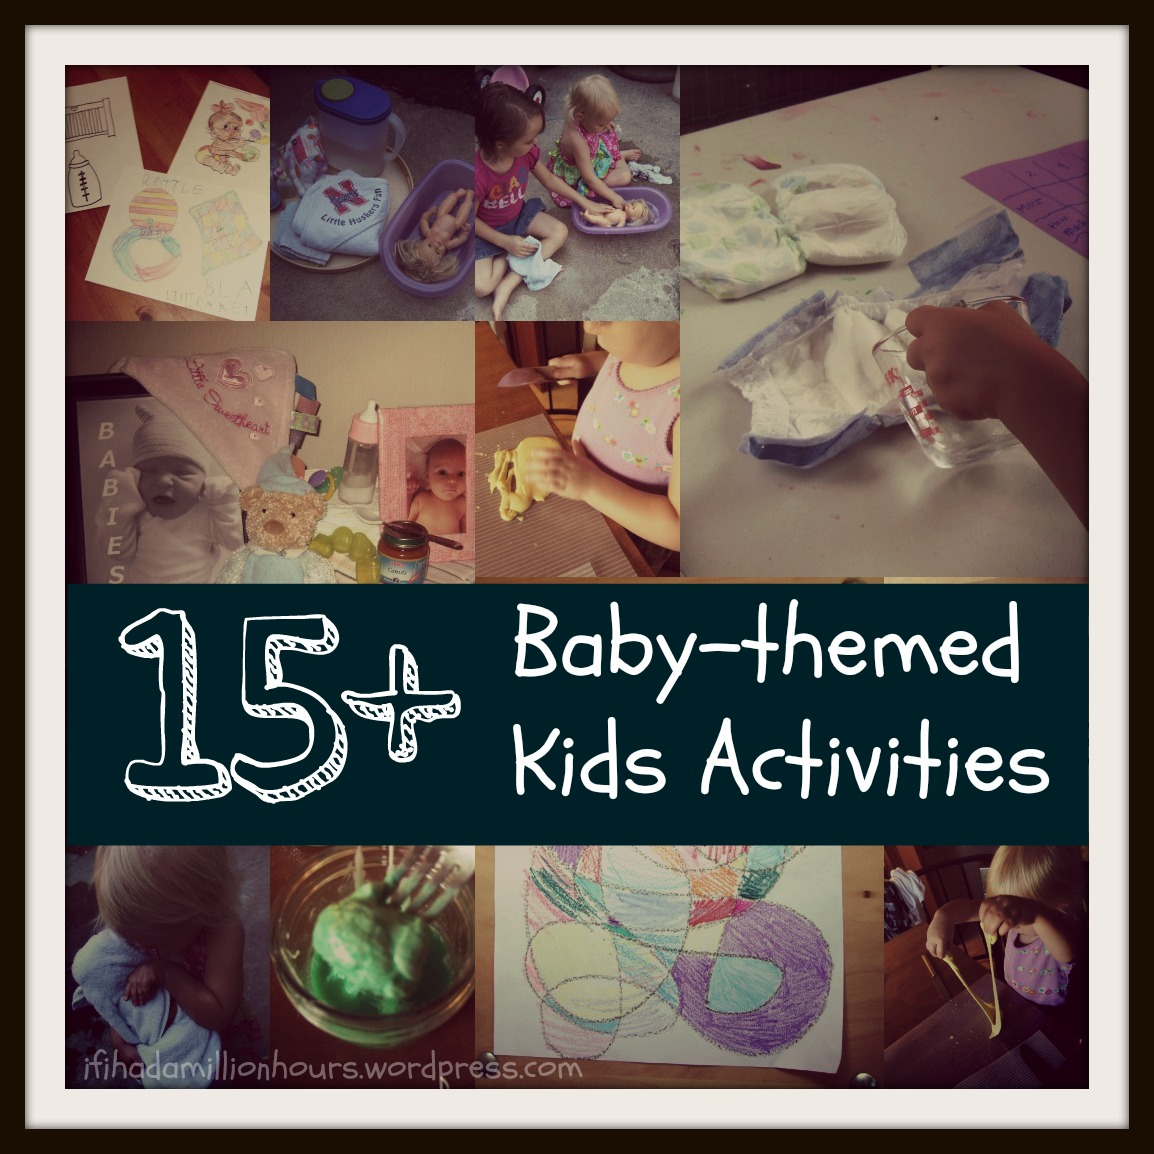 Babies Weekly Theme 1 If I Had A Million Hours